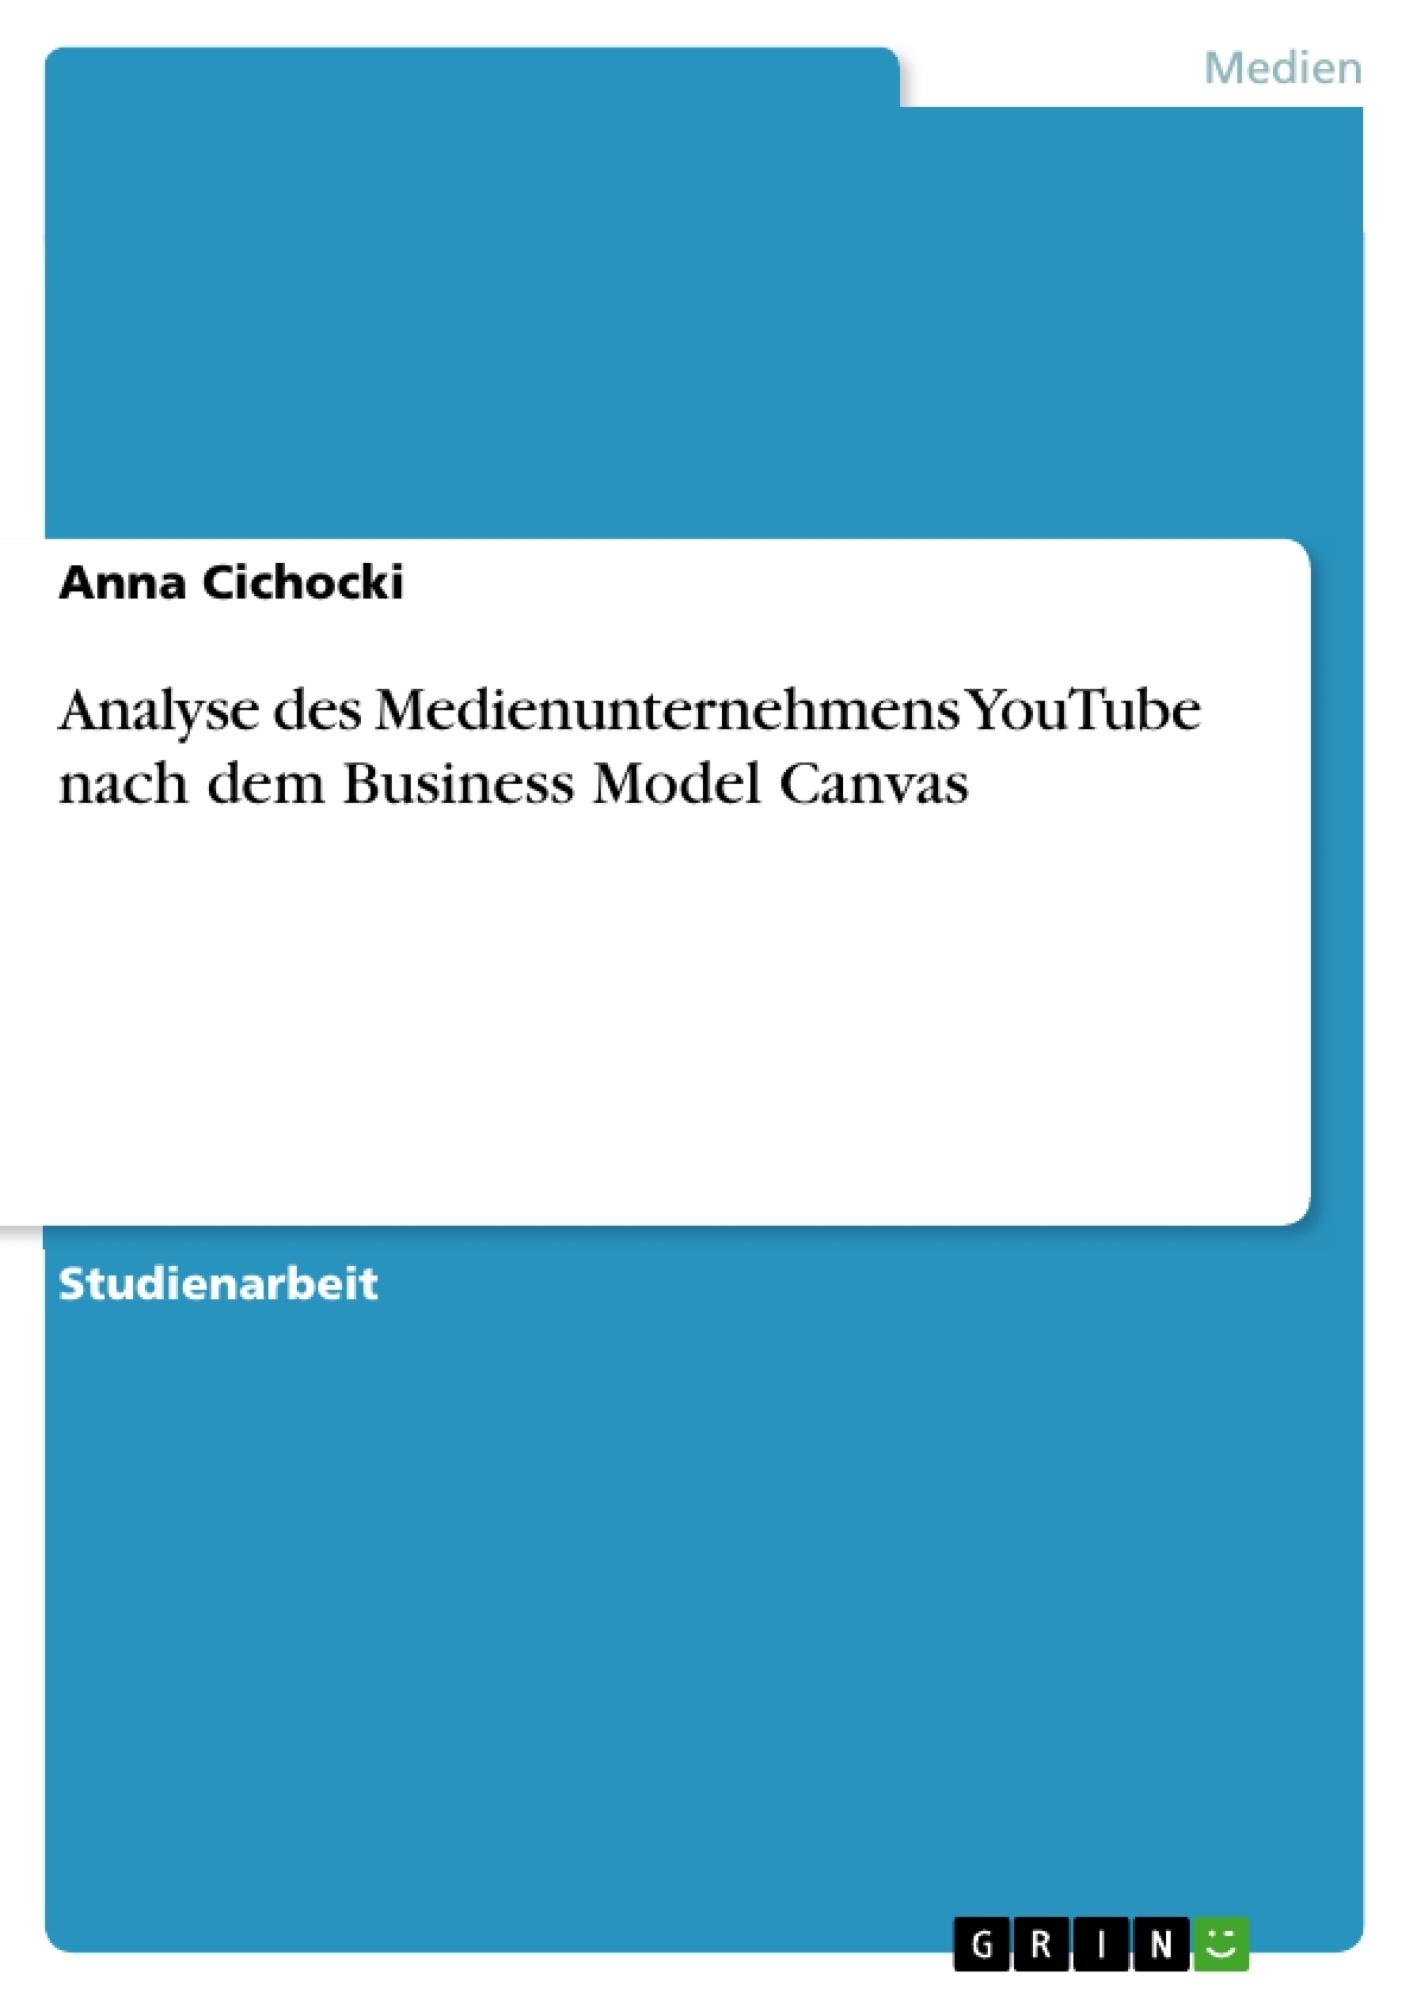 Titel: Analyse des Medienunternehmens YouTube nach dem Business Model Canvas